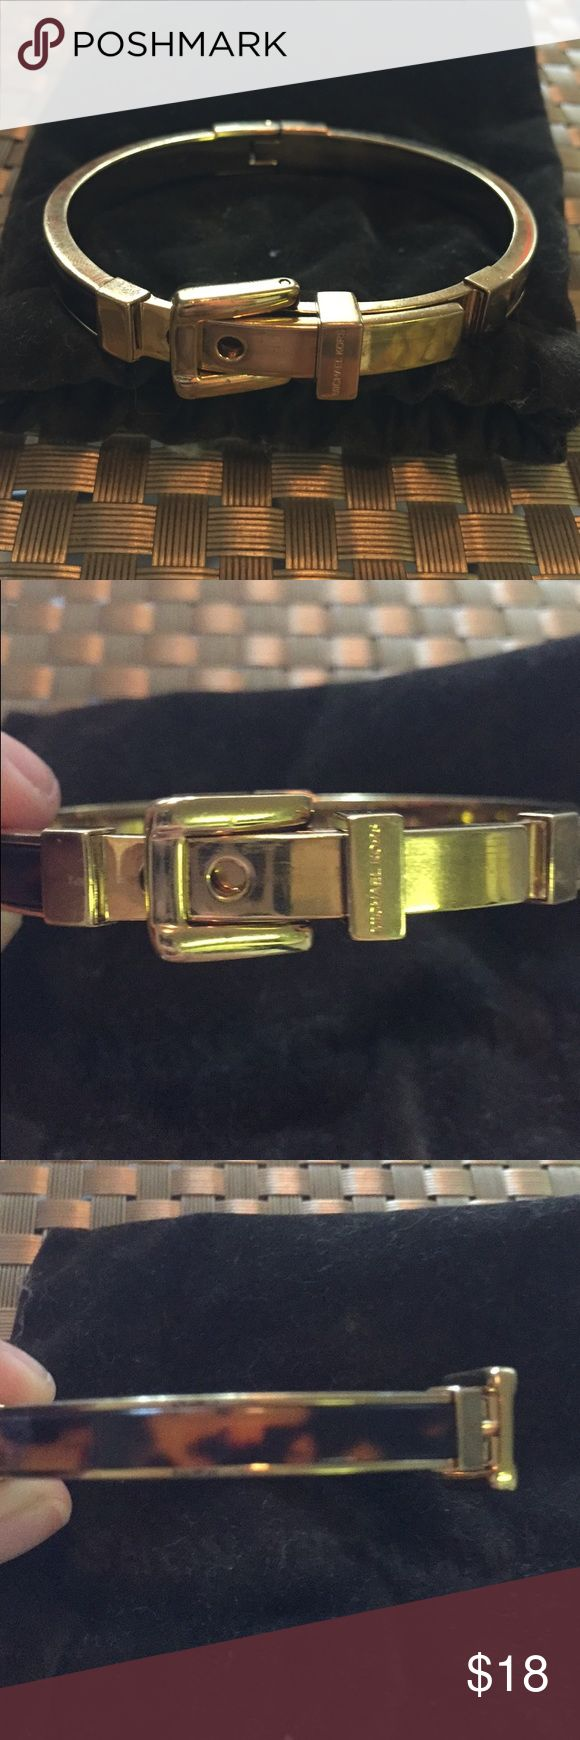 Micheal Kors buckle bracelet Michael Kors buckle bracelet Michael Kors Jewelry Bracelets